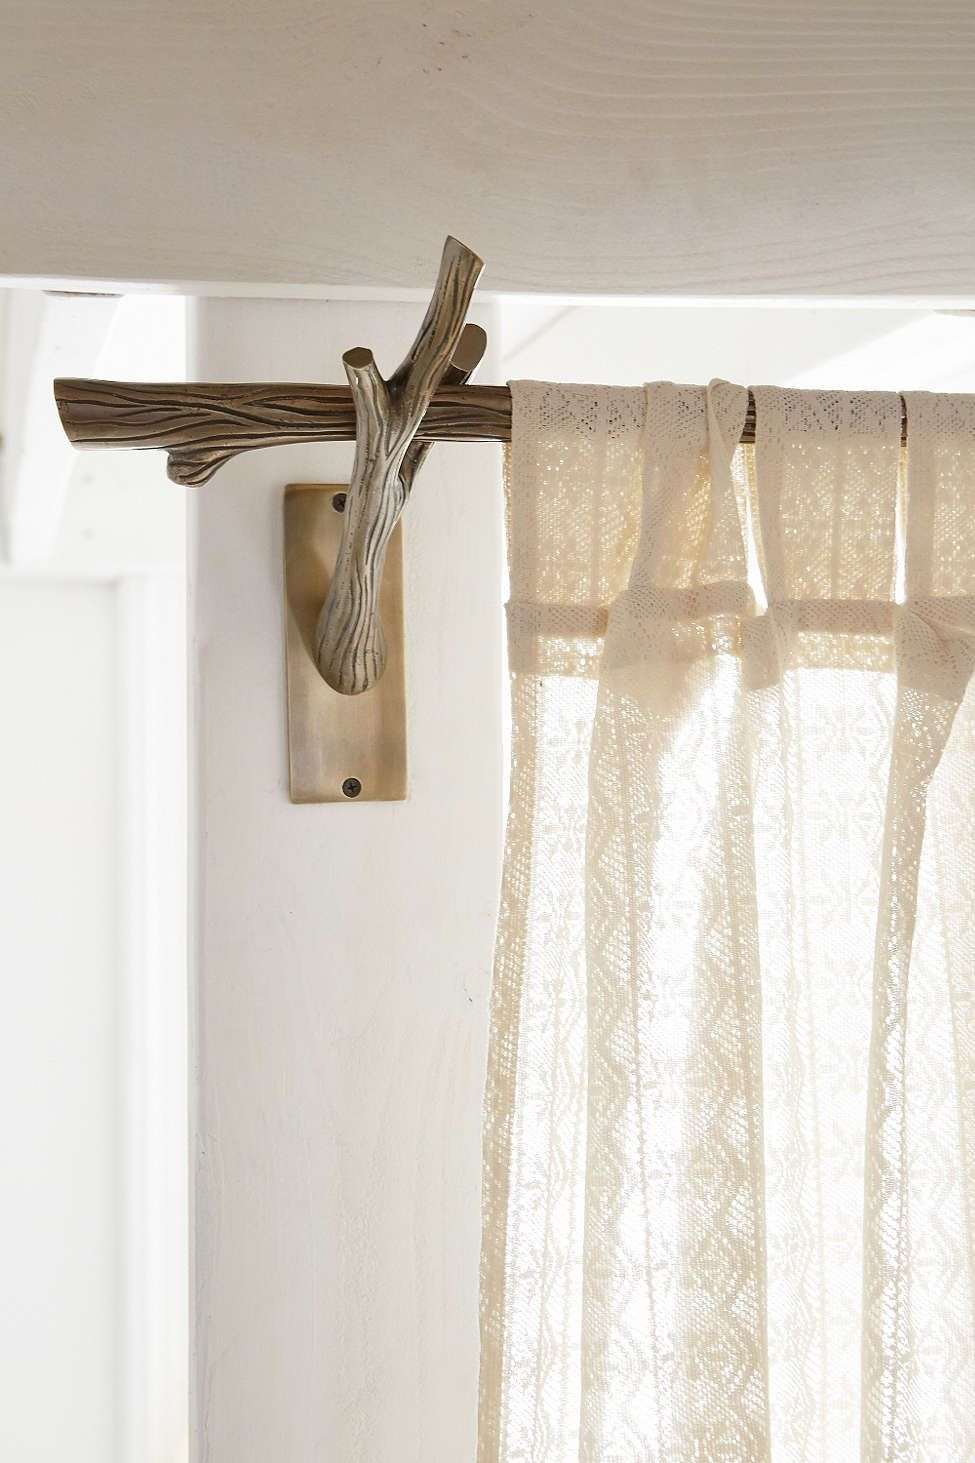 4040 Locust Branch Curtain Rod | Branch curtain rods, Themed ...